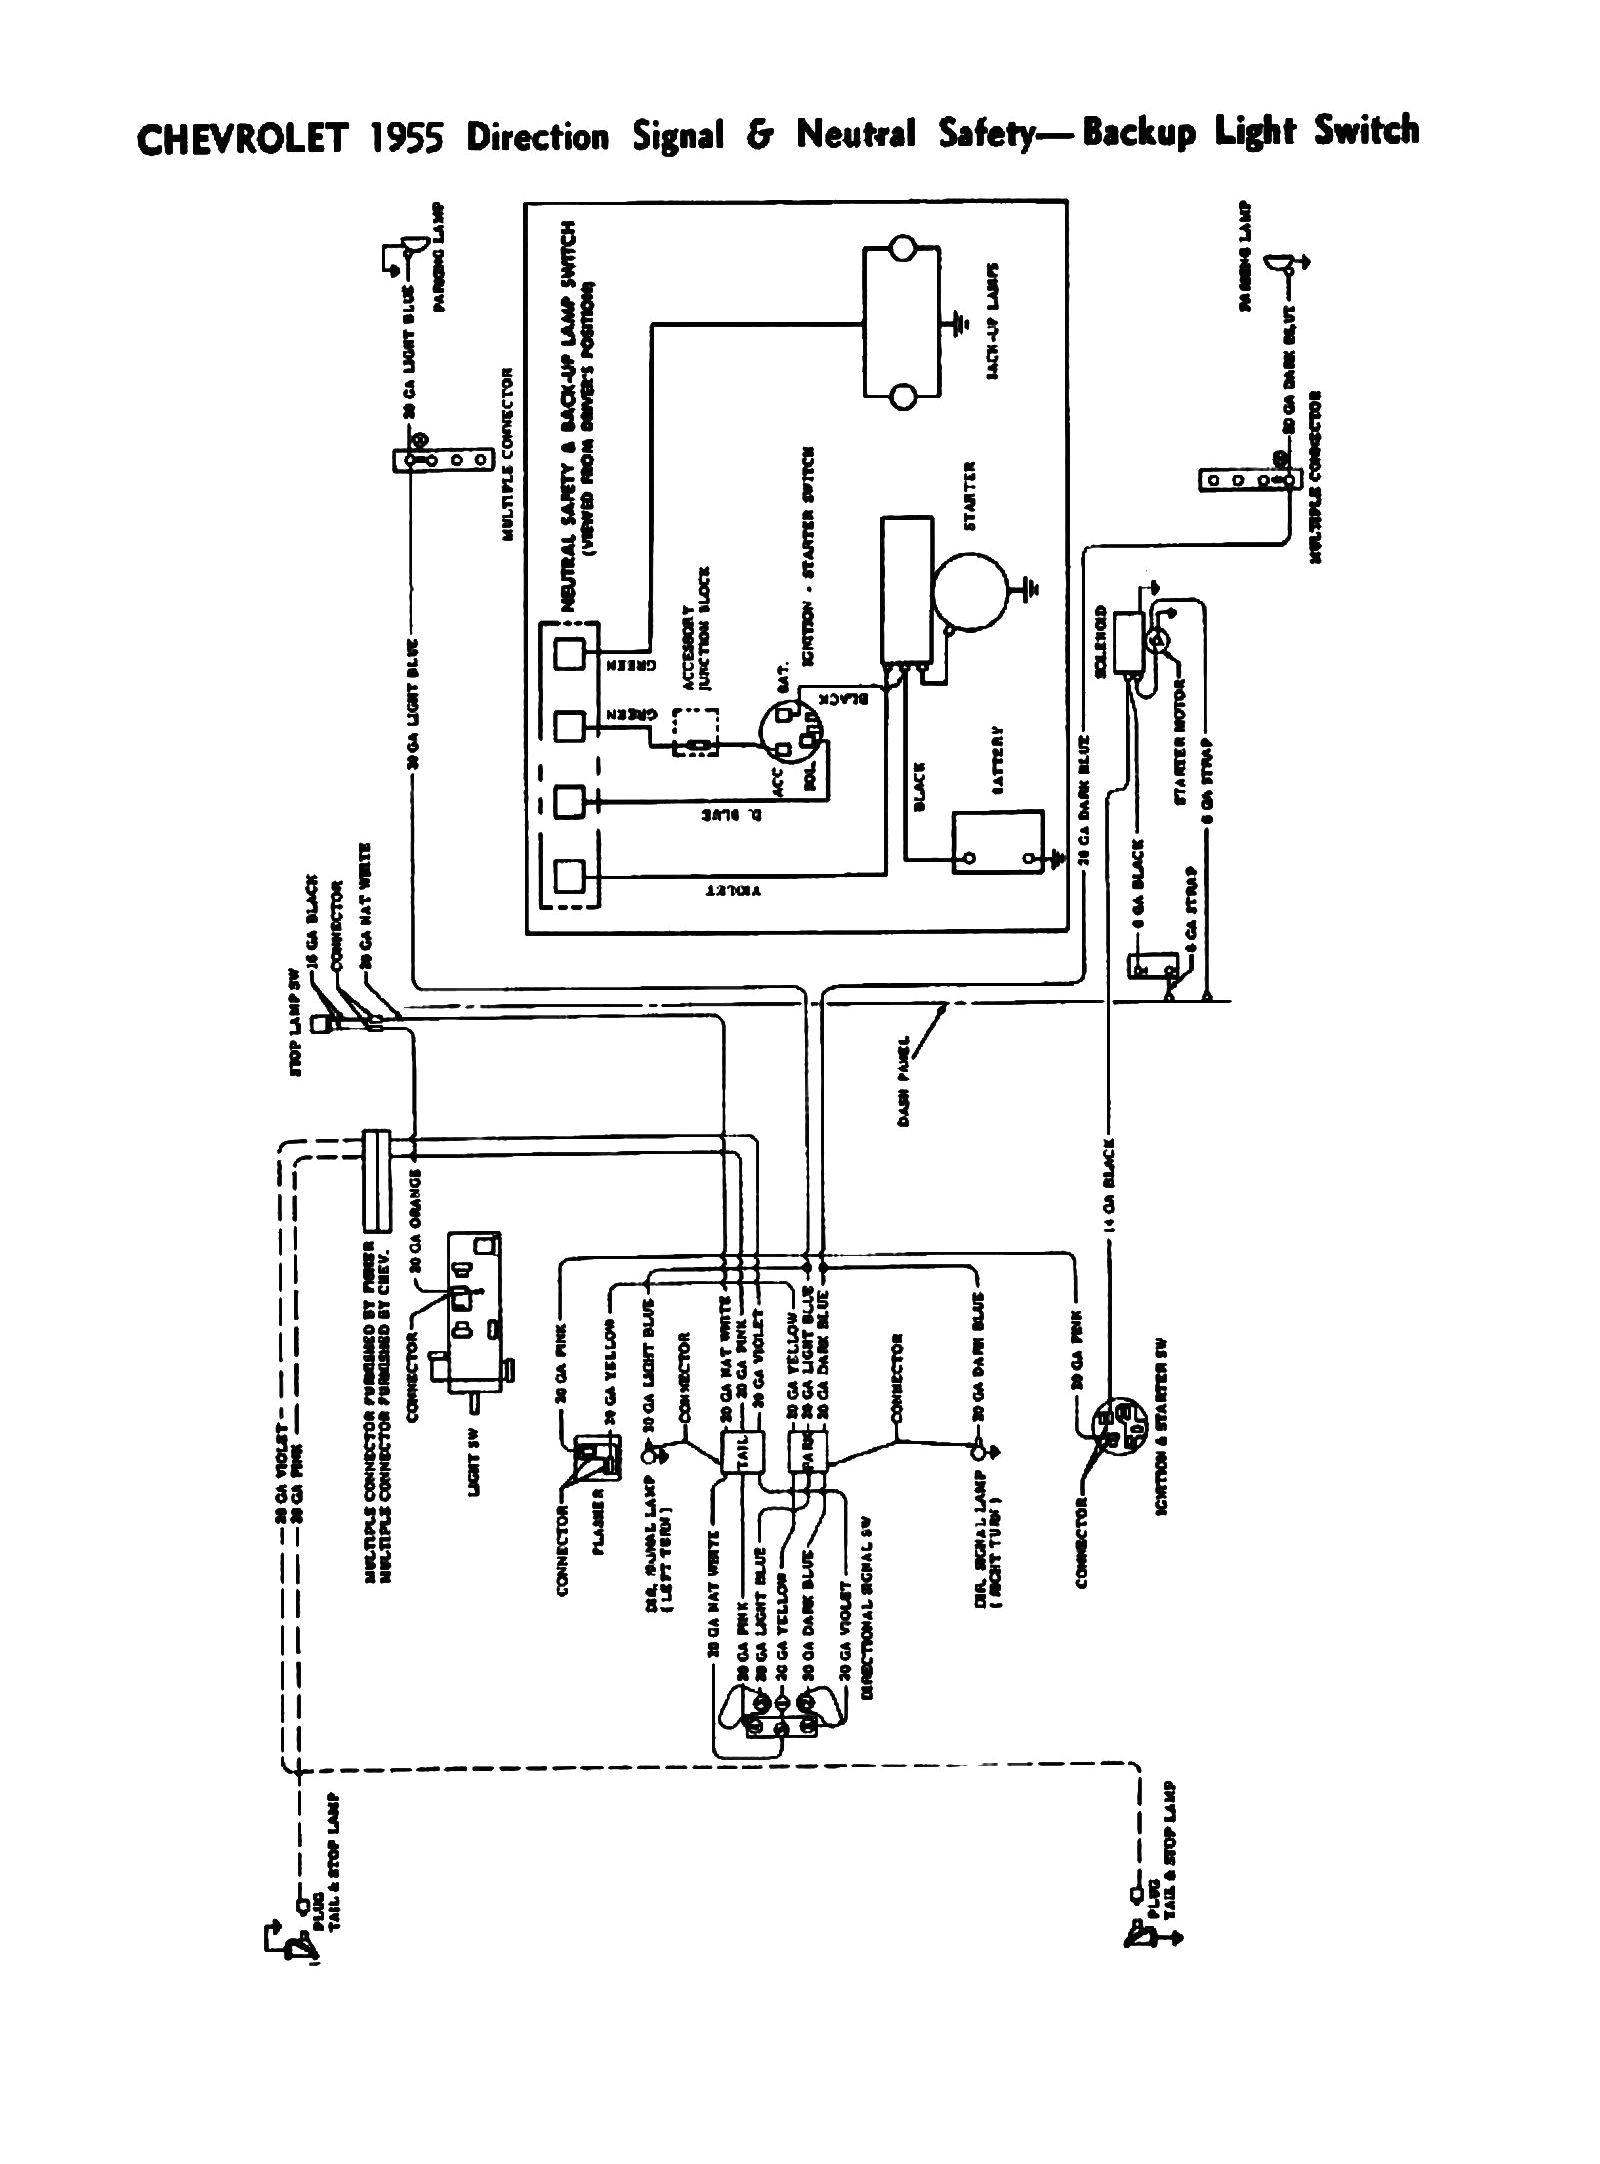 1957 chevy truck ignition system schematic autos post blog wiring car ignition wiring chevy truck switch diagram